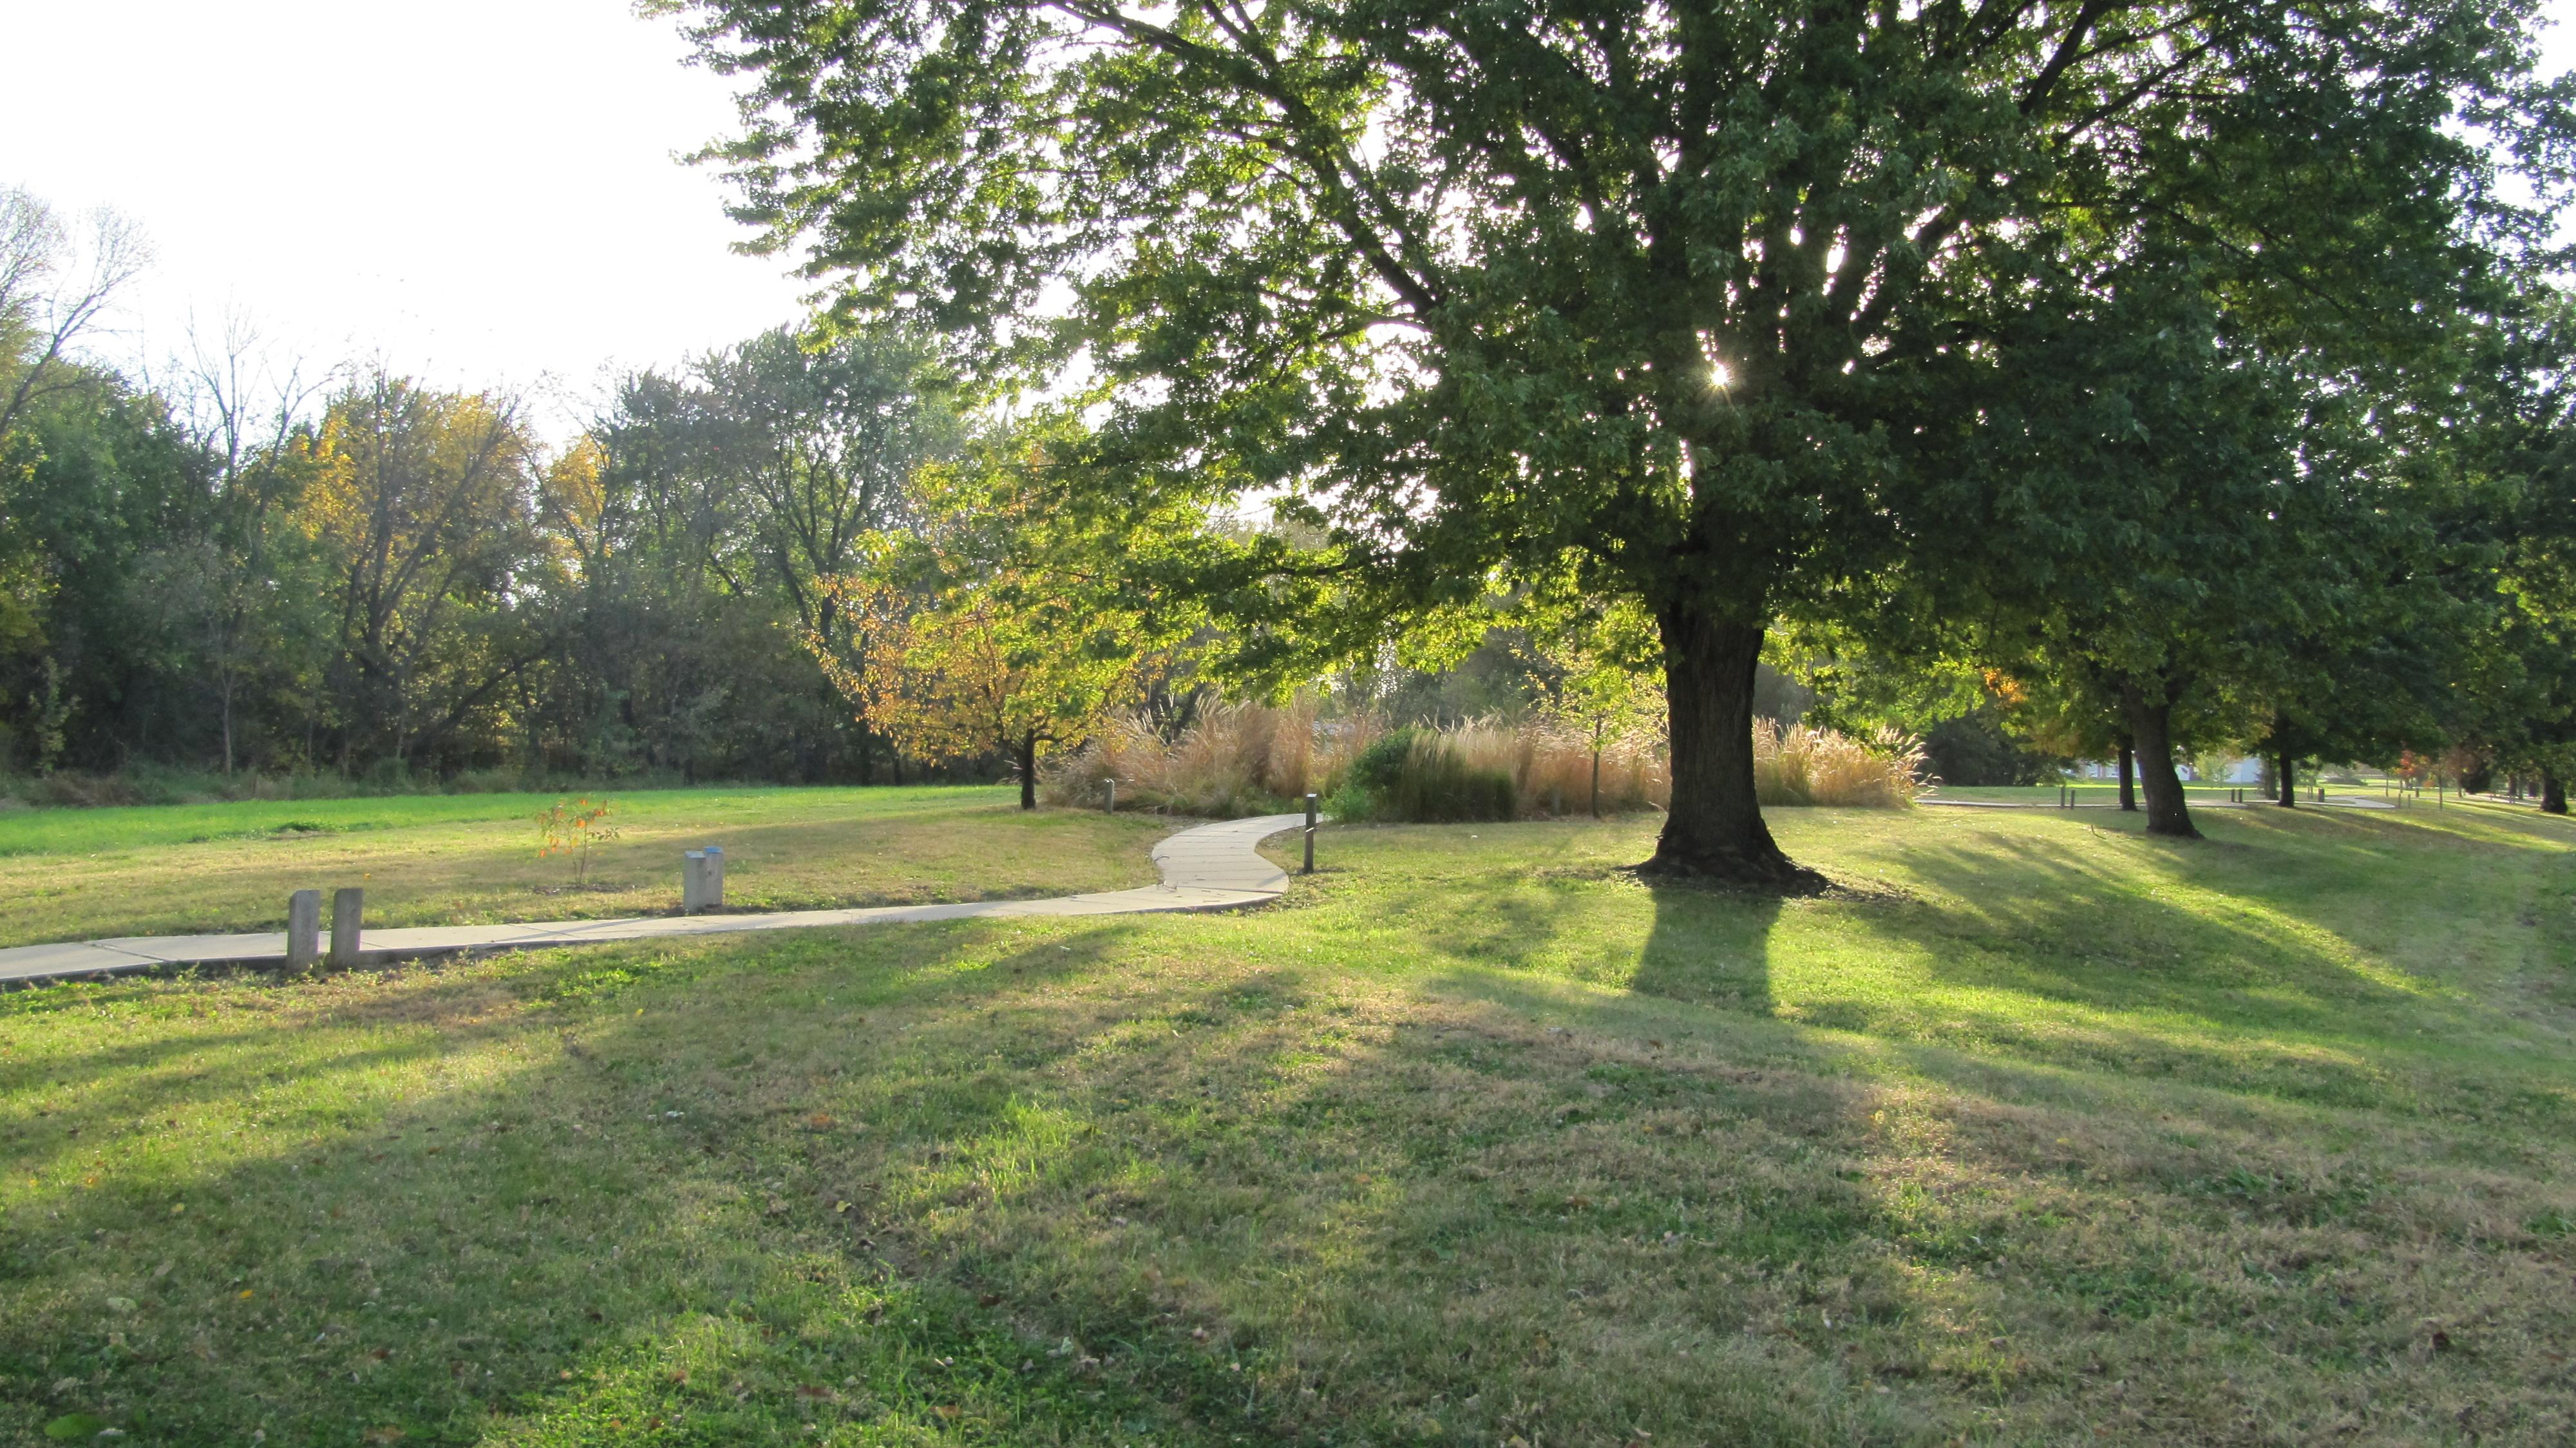 Go on an Arboretum Adventure this summer!